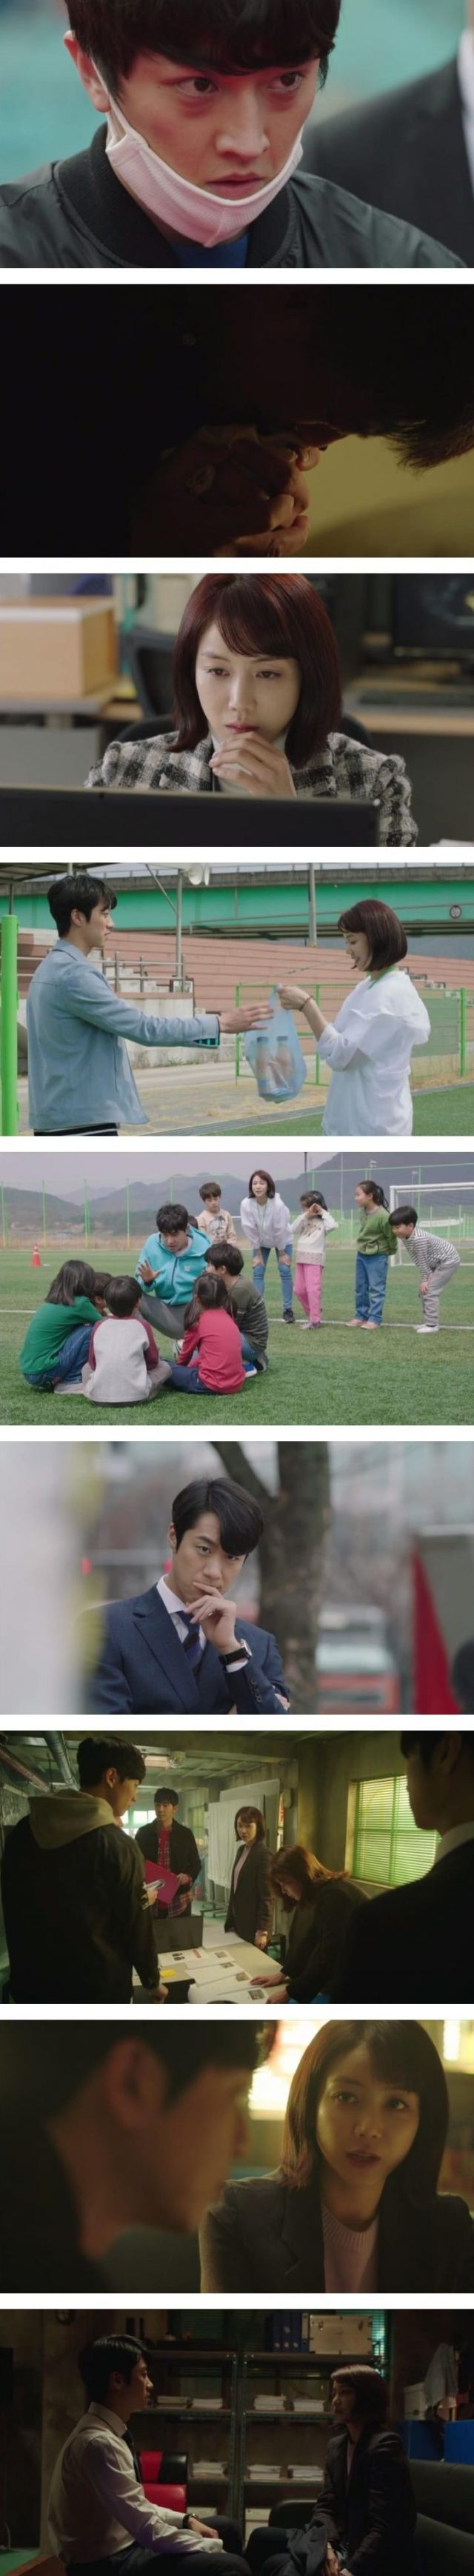 Risultati immagini per kdrama CHILDREN OF A LESSER GOD episode 12